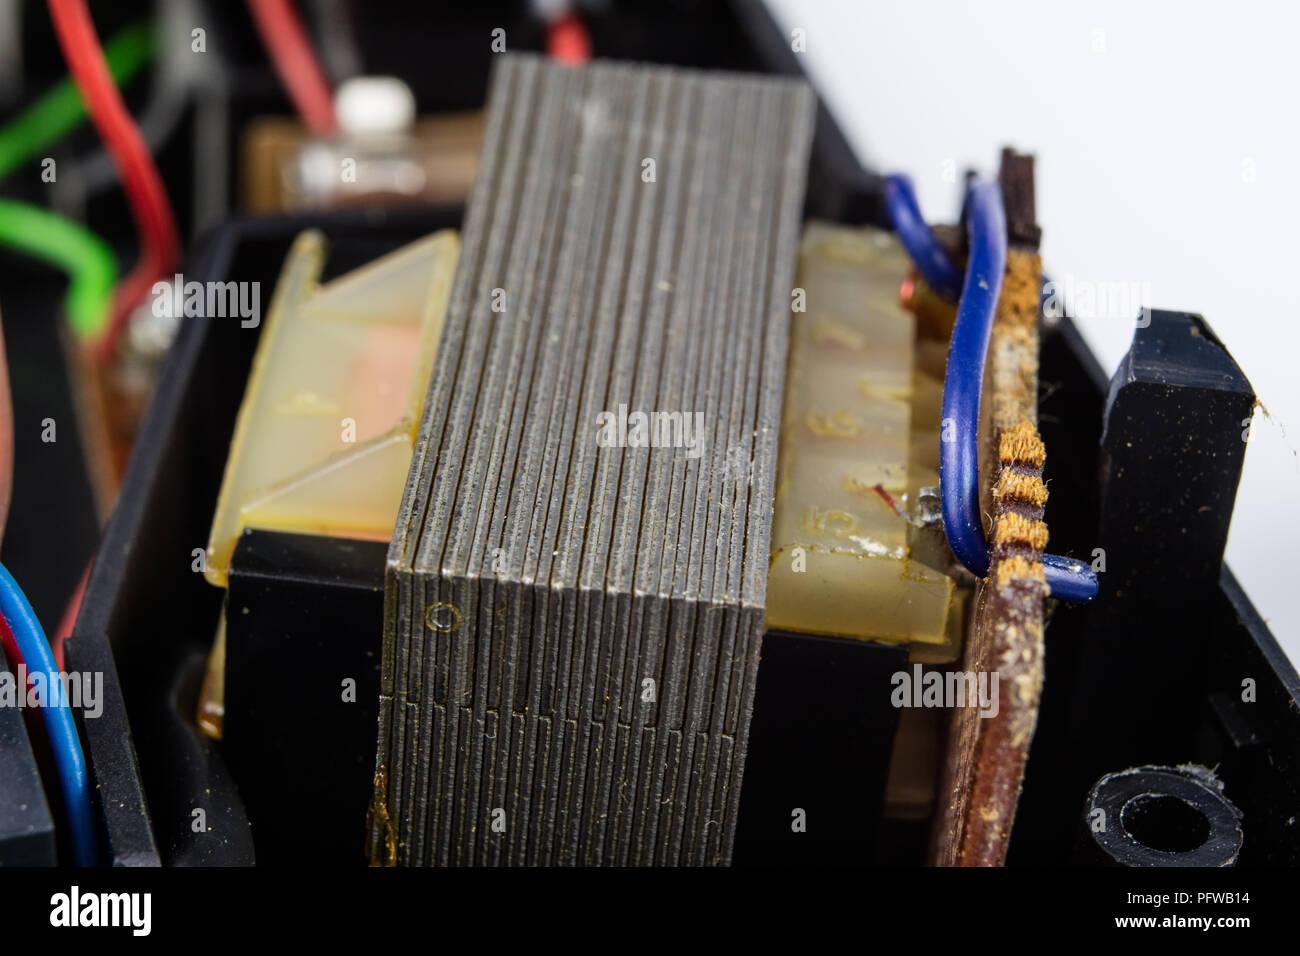 Repair Of Printed Circuit Boards In The Radio Laboratory